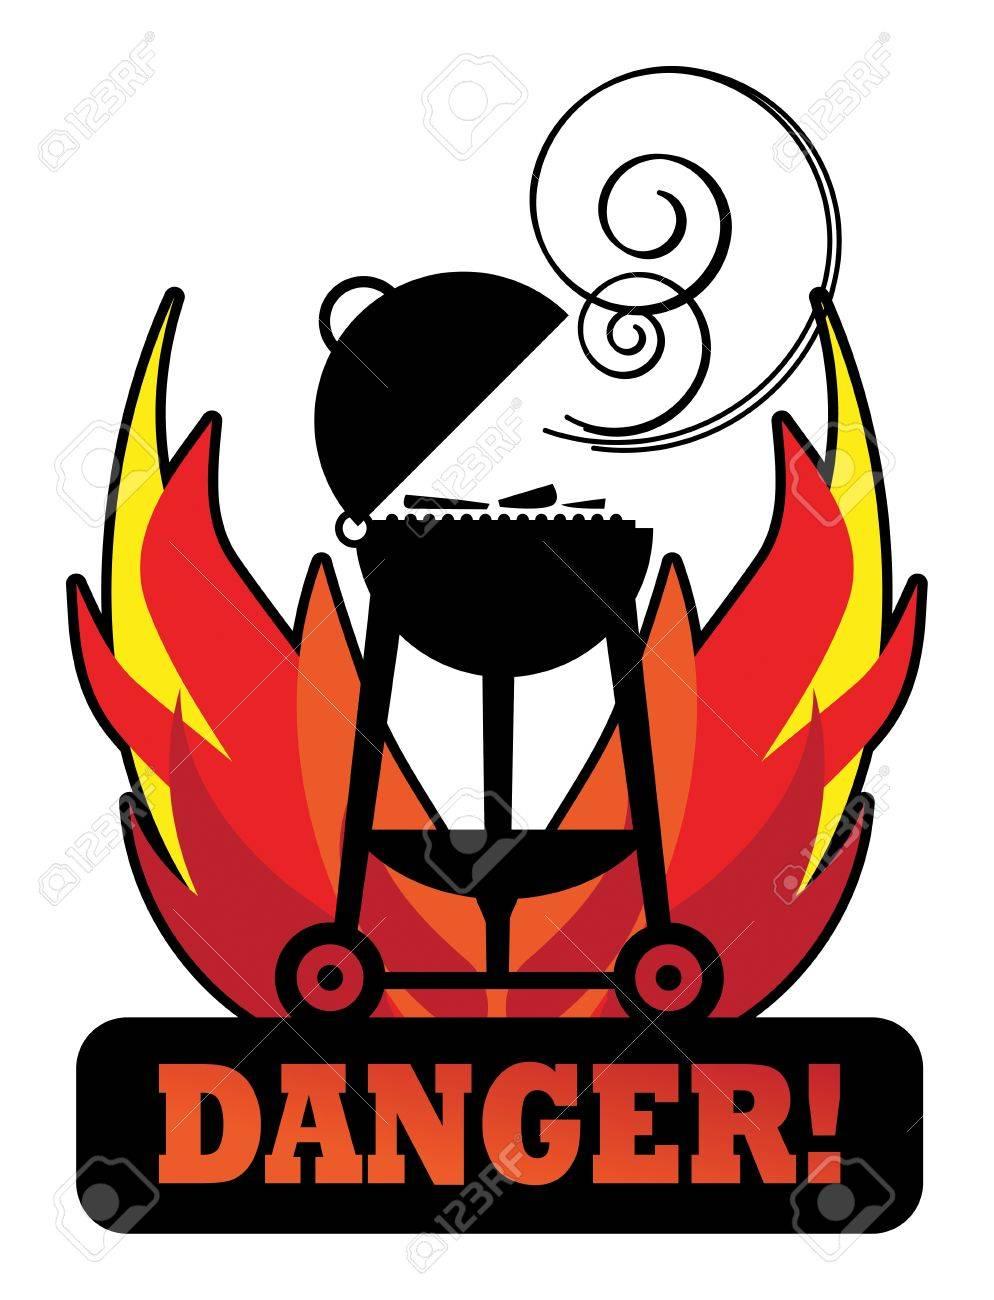 Grill Danger sign Stock Vector - 15314099